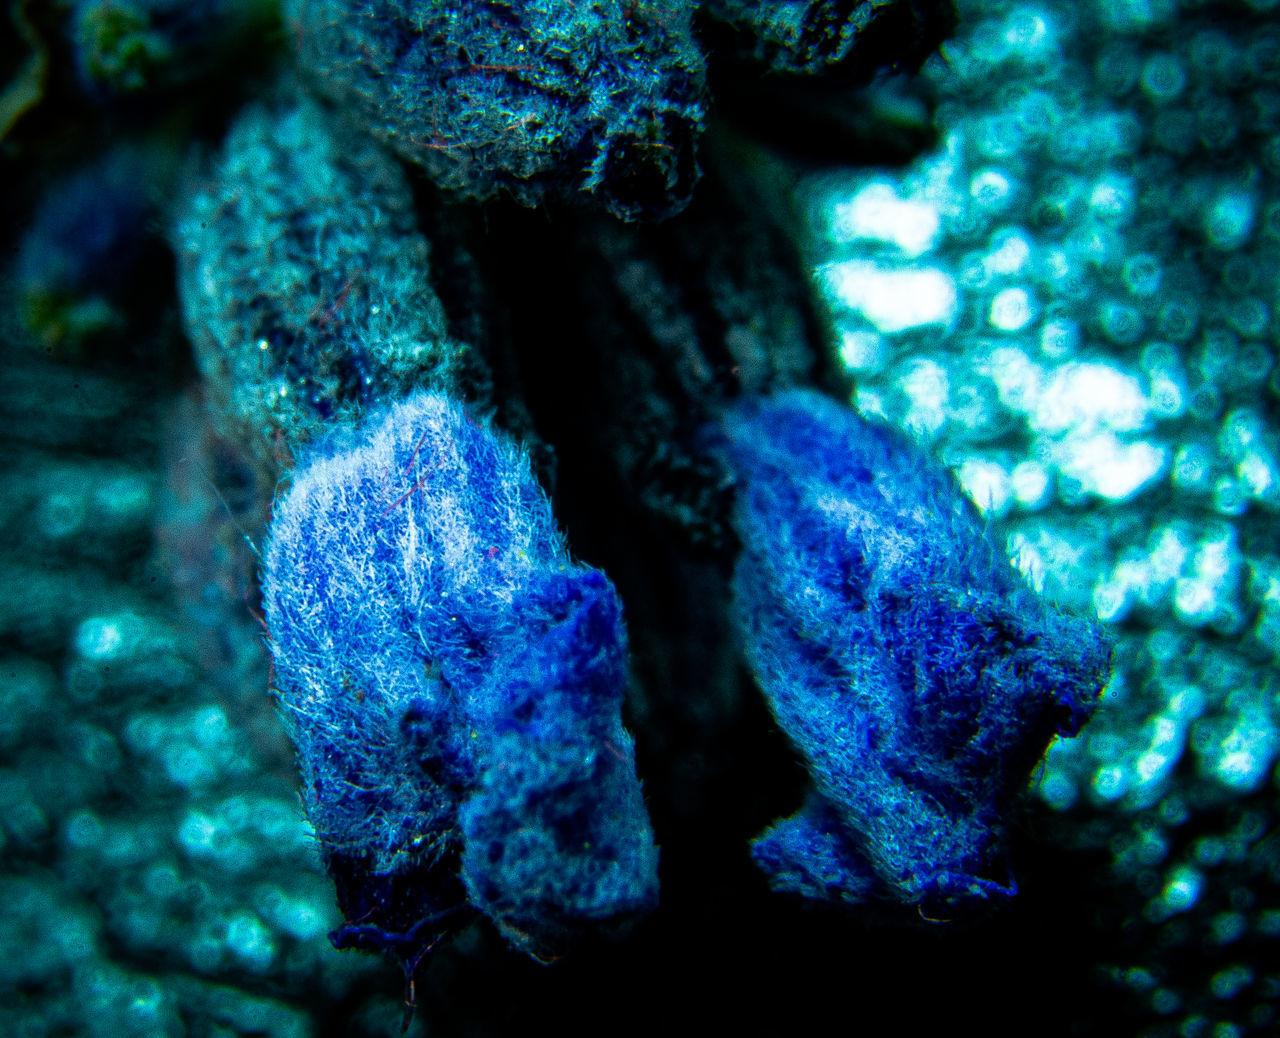 CLOSE-UP OF BLUE ROCKS